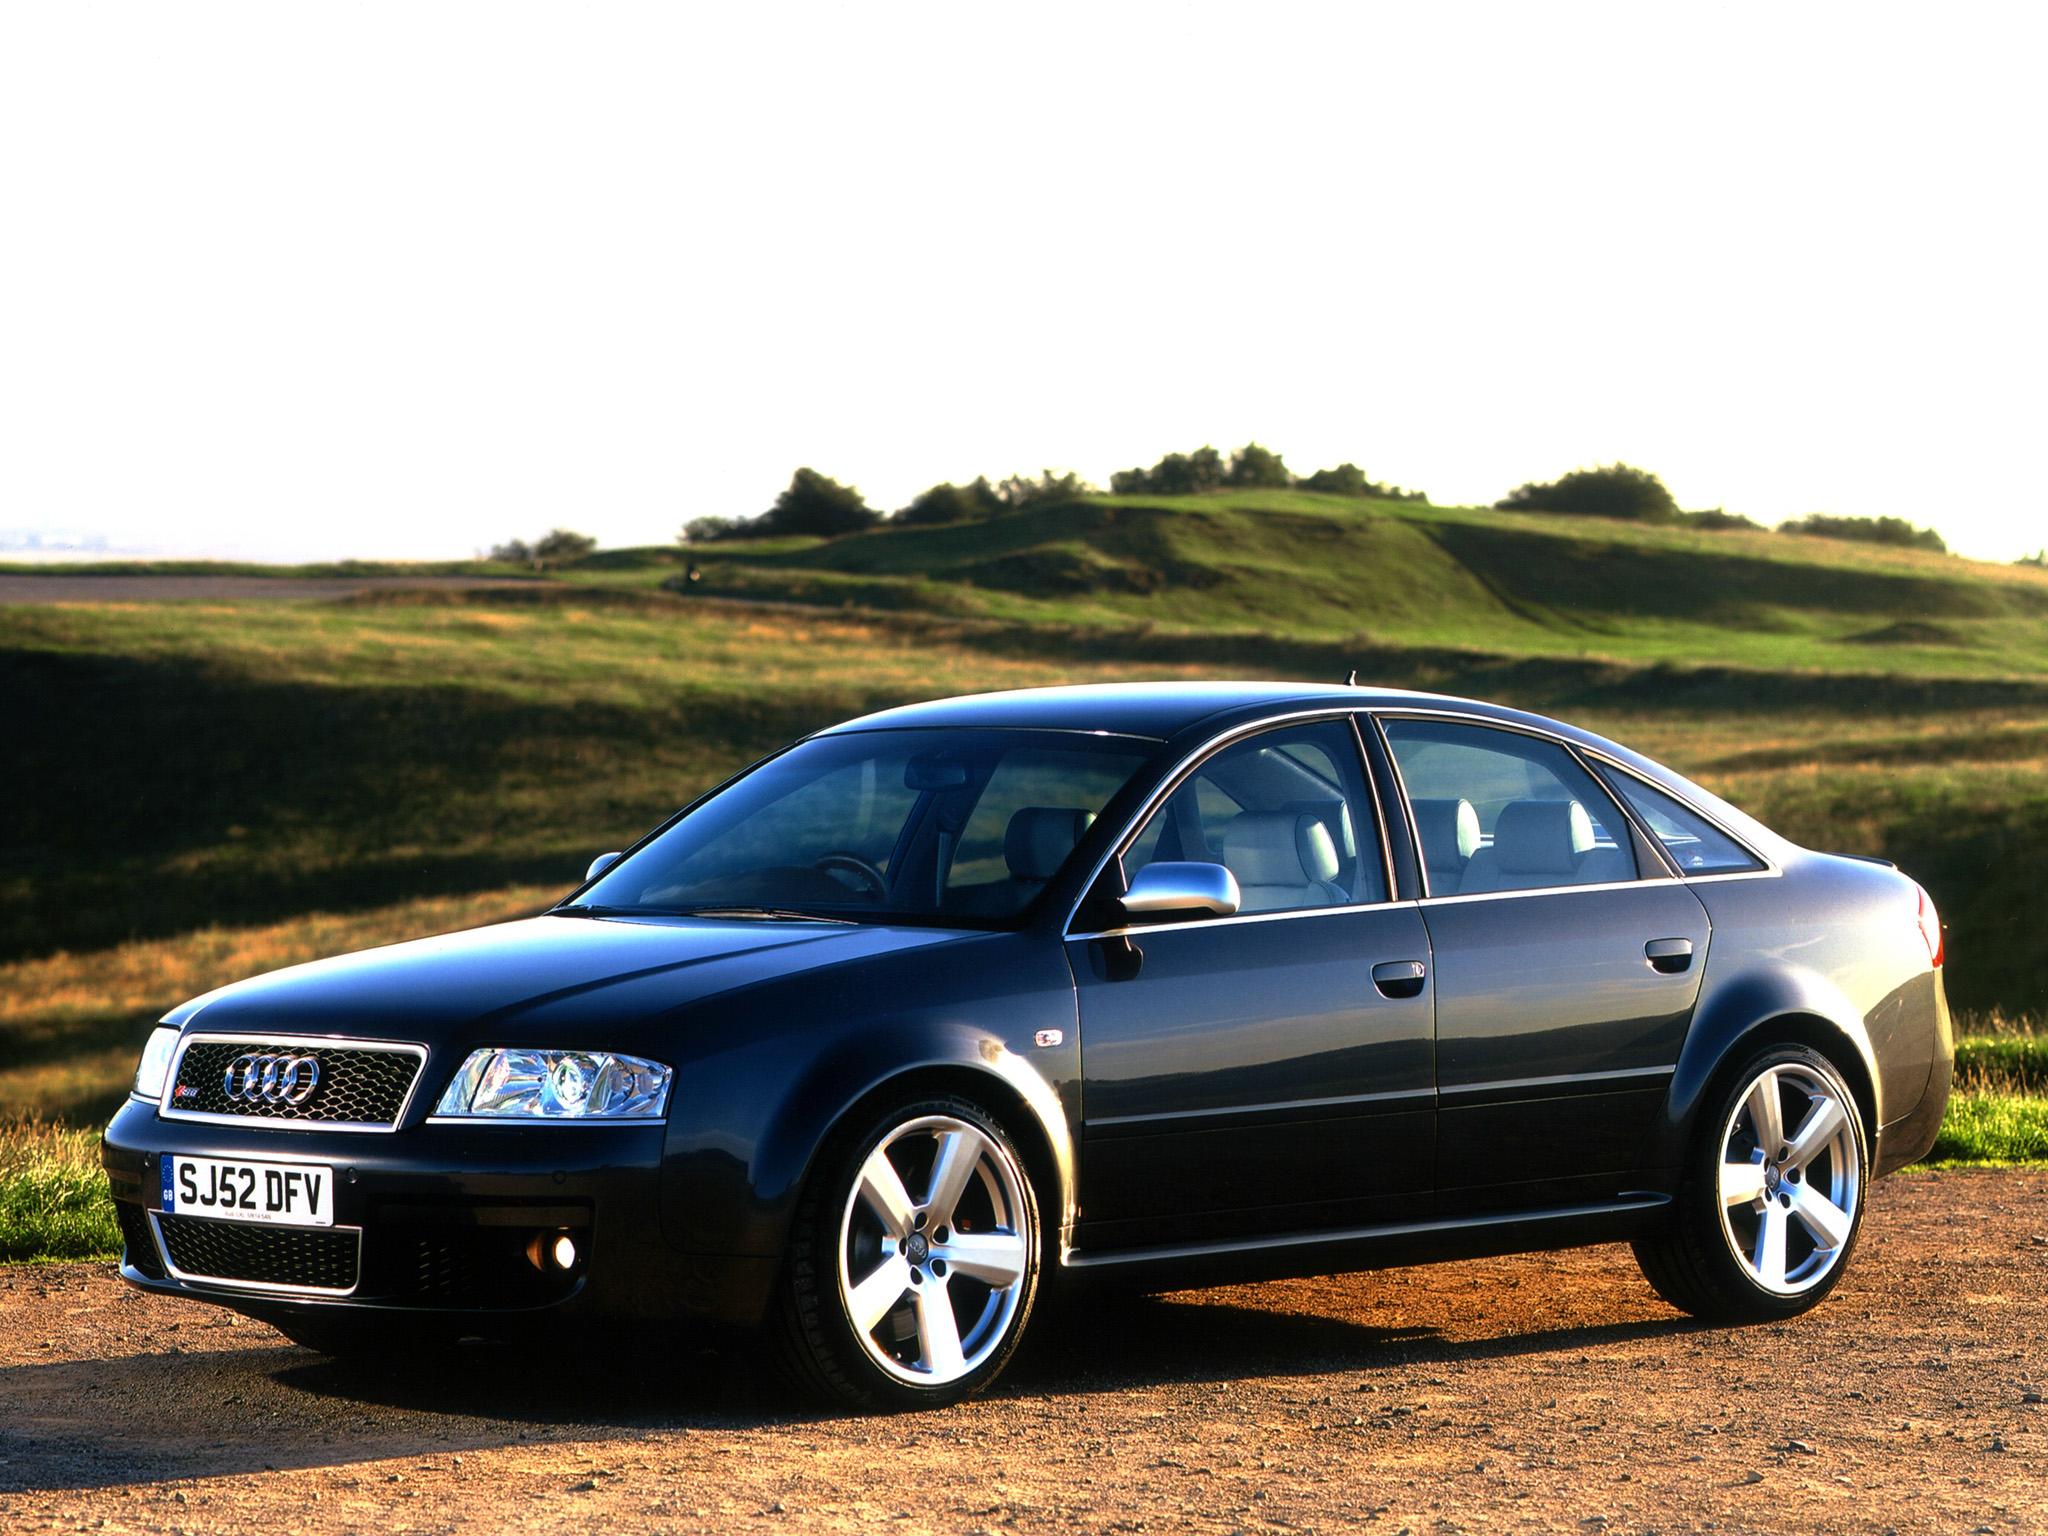 Audi RS 6 I (C5) 2002 - 2004 Sedan #1